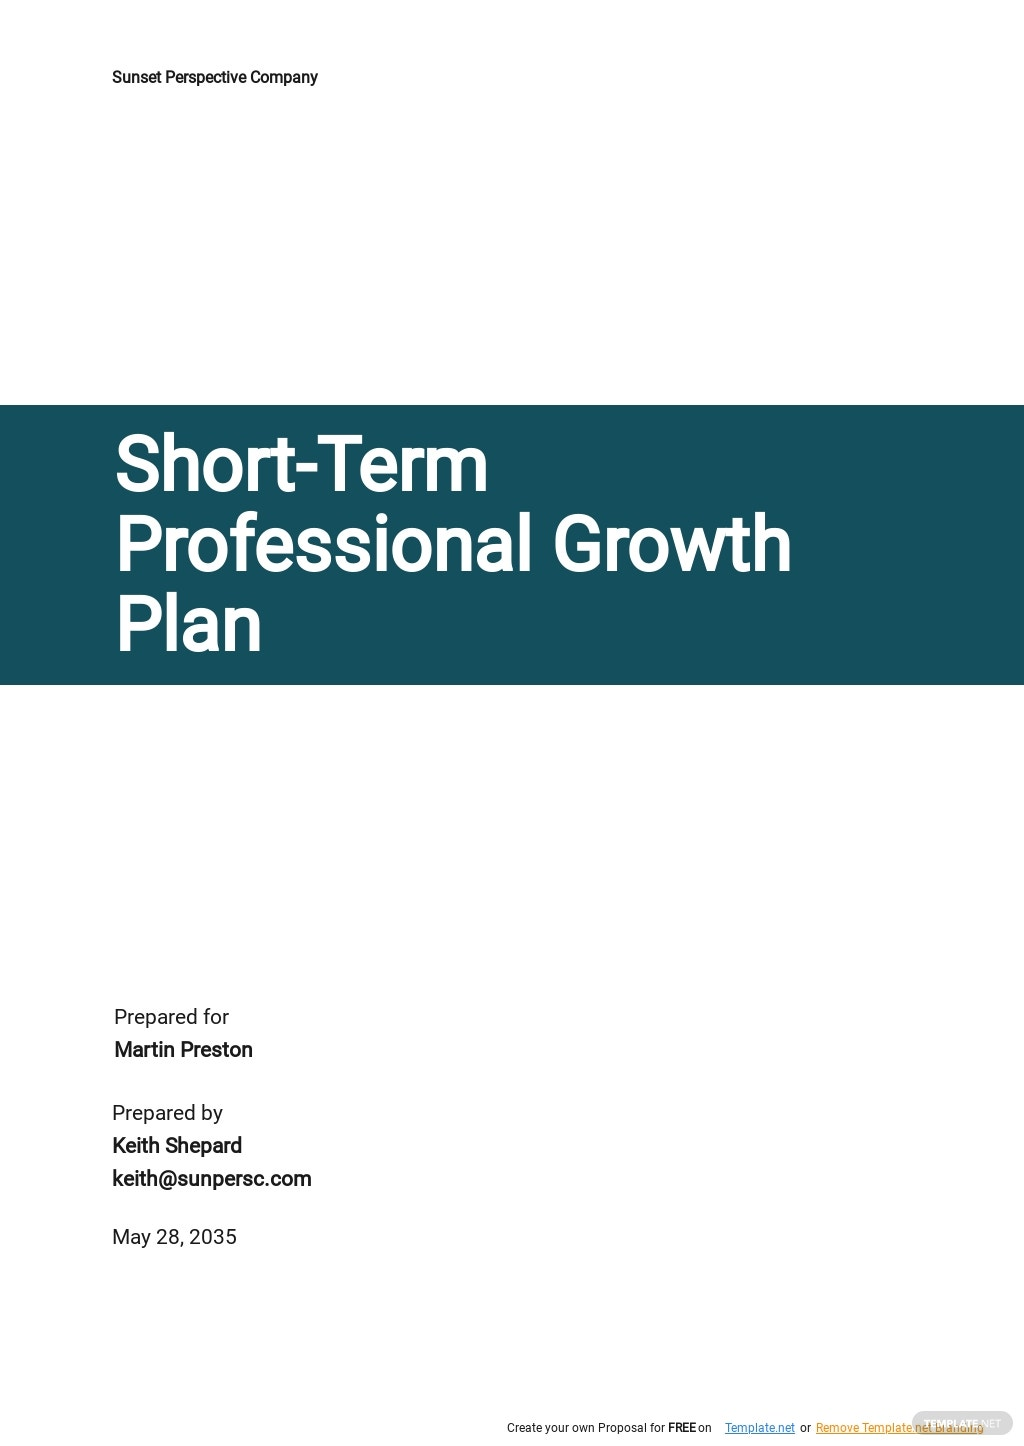 Short Term Professional Growth Plan Template.jpe